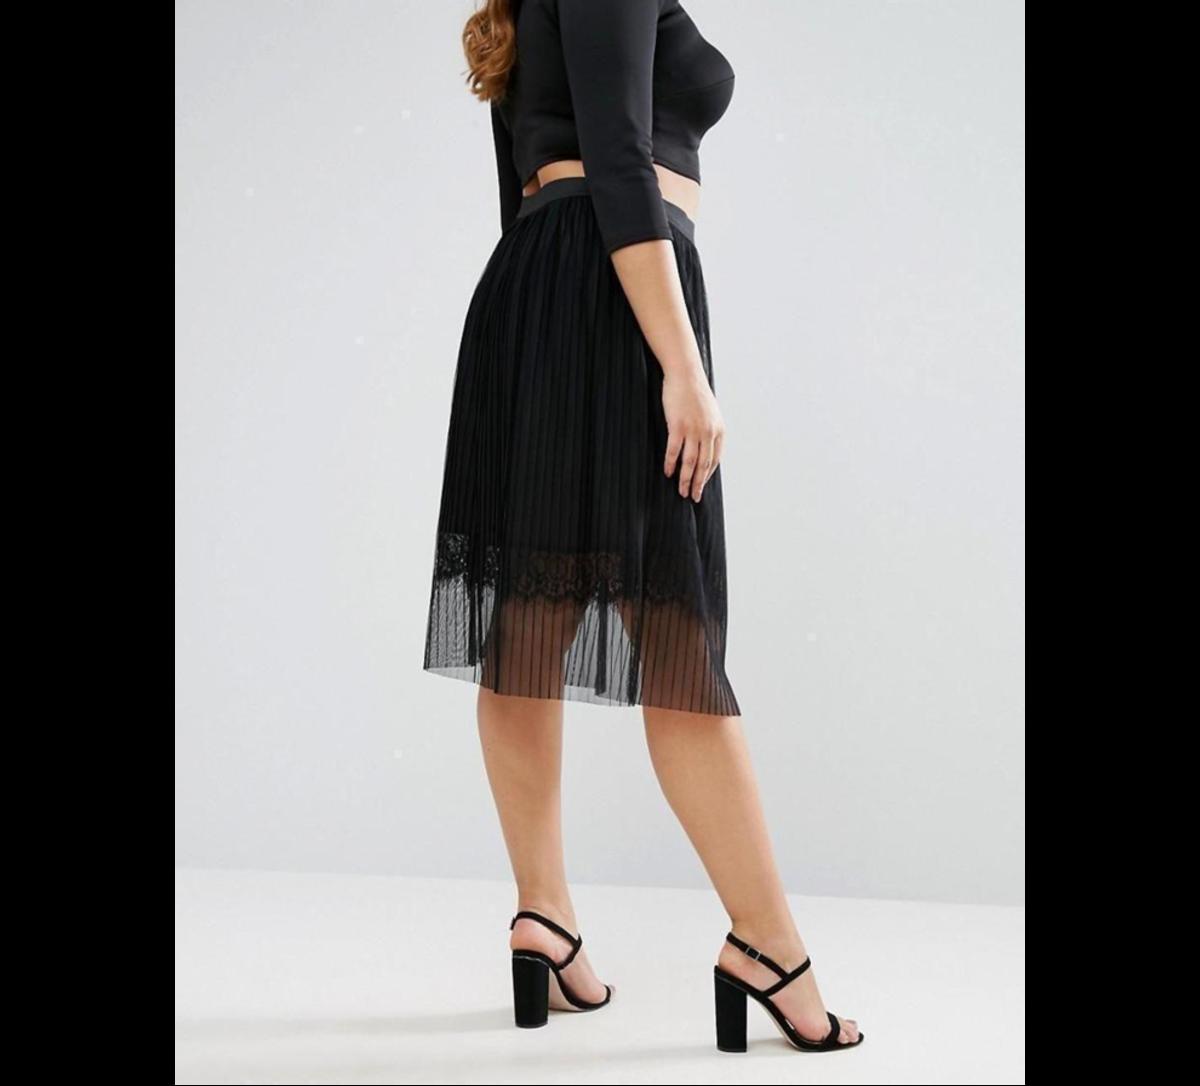 midi skirt: sheer pleated tulle, lace underlay, high-rise waist